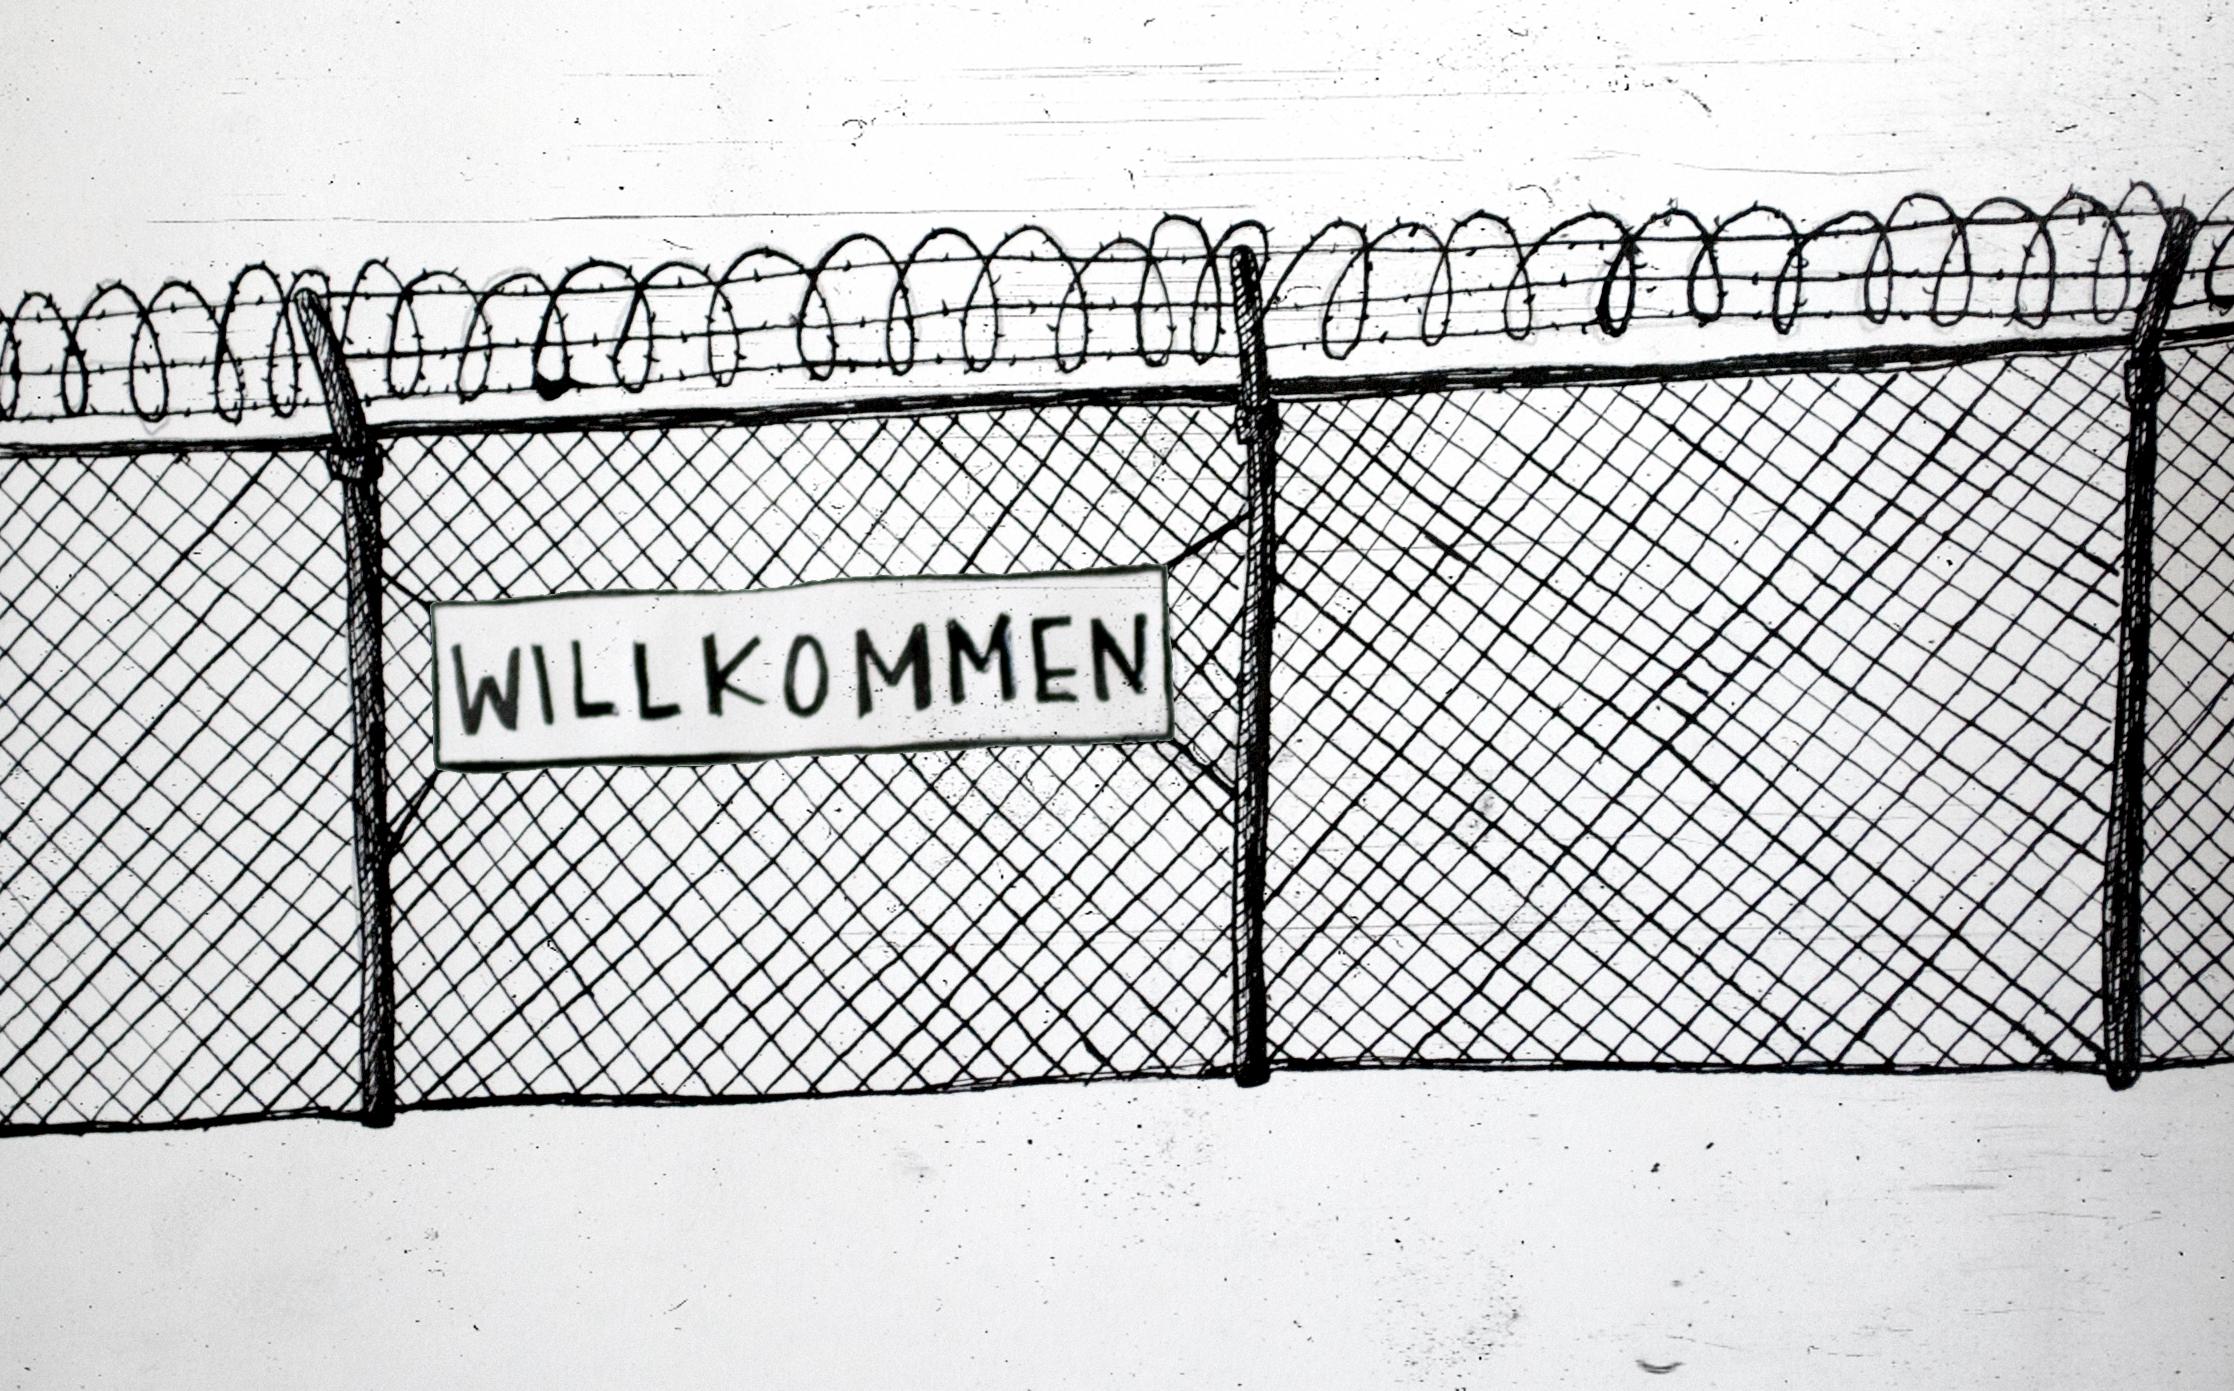 Duitsland scherpt grensbewaking aan